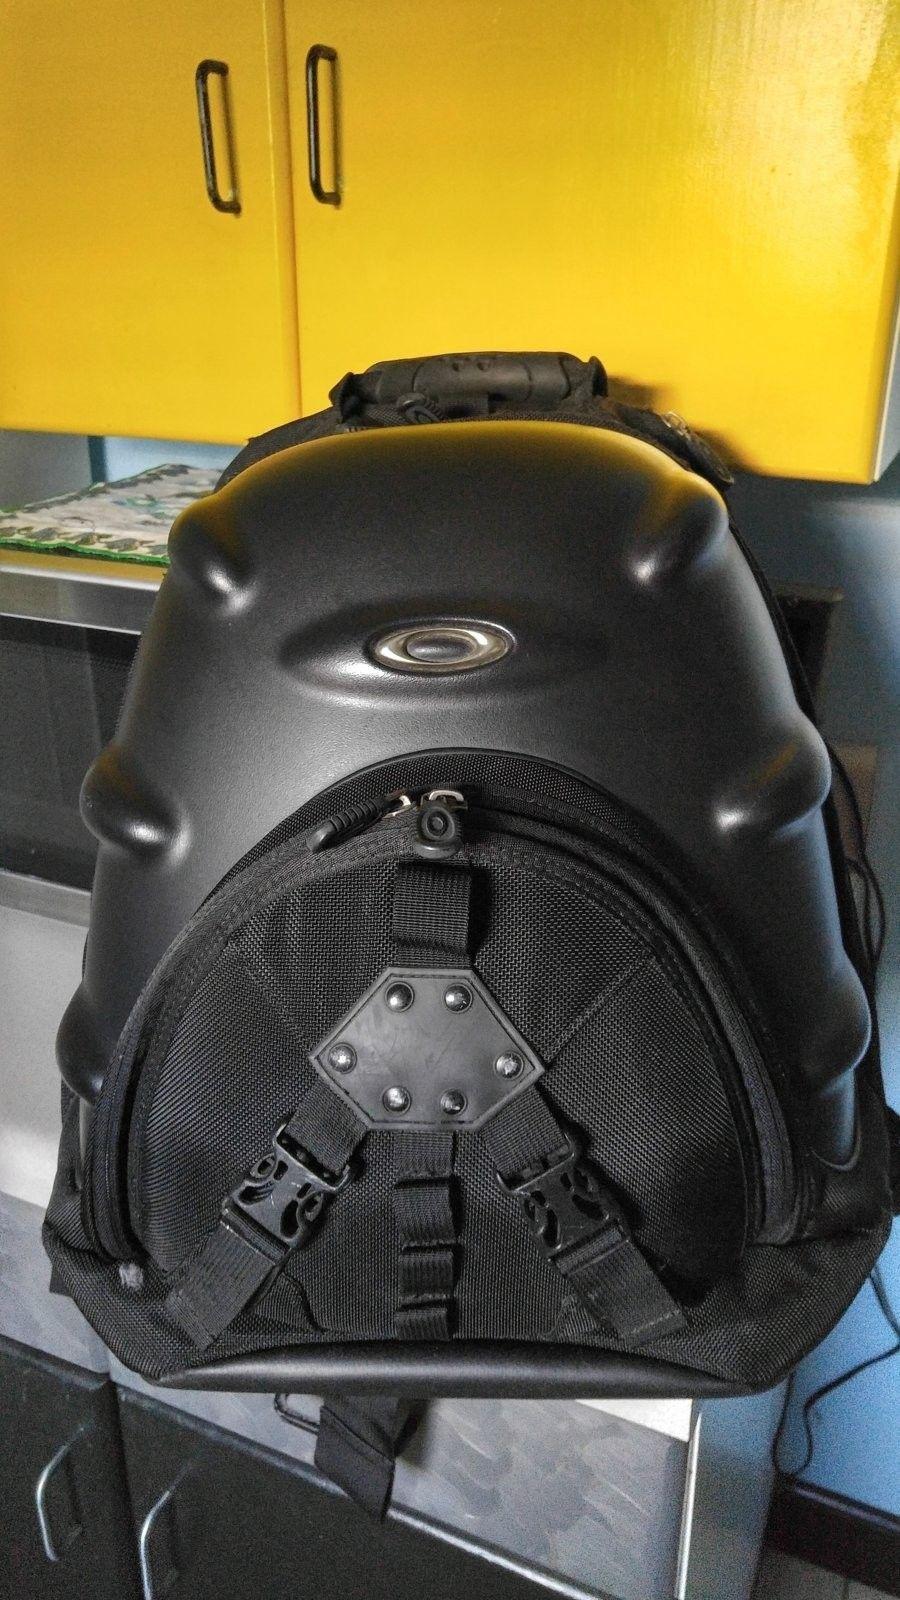 Oakley hard shell factory rep bag... - 20160226_164747_HDR (1).jpg